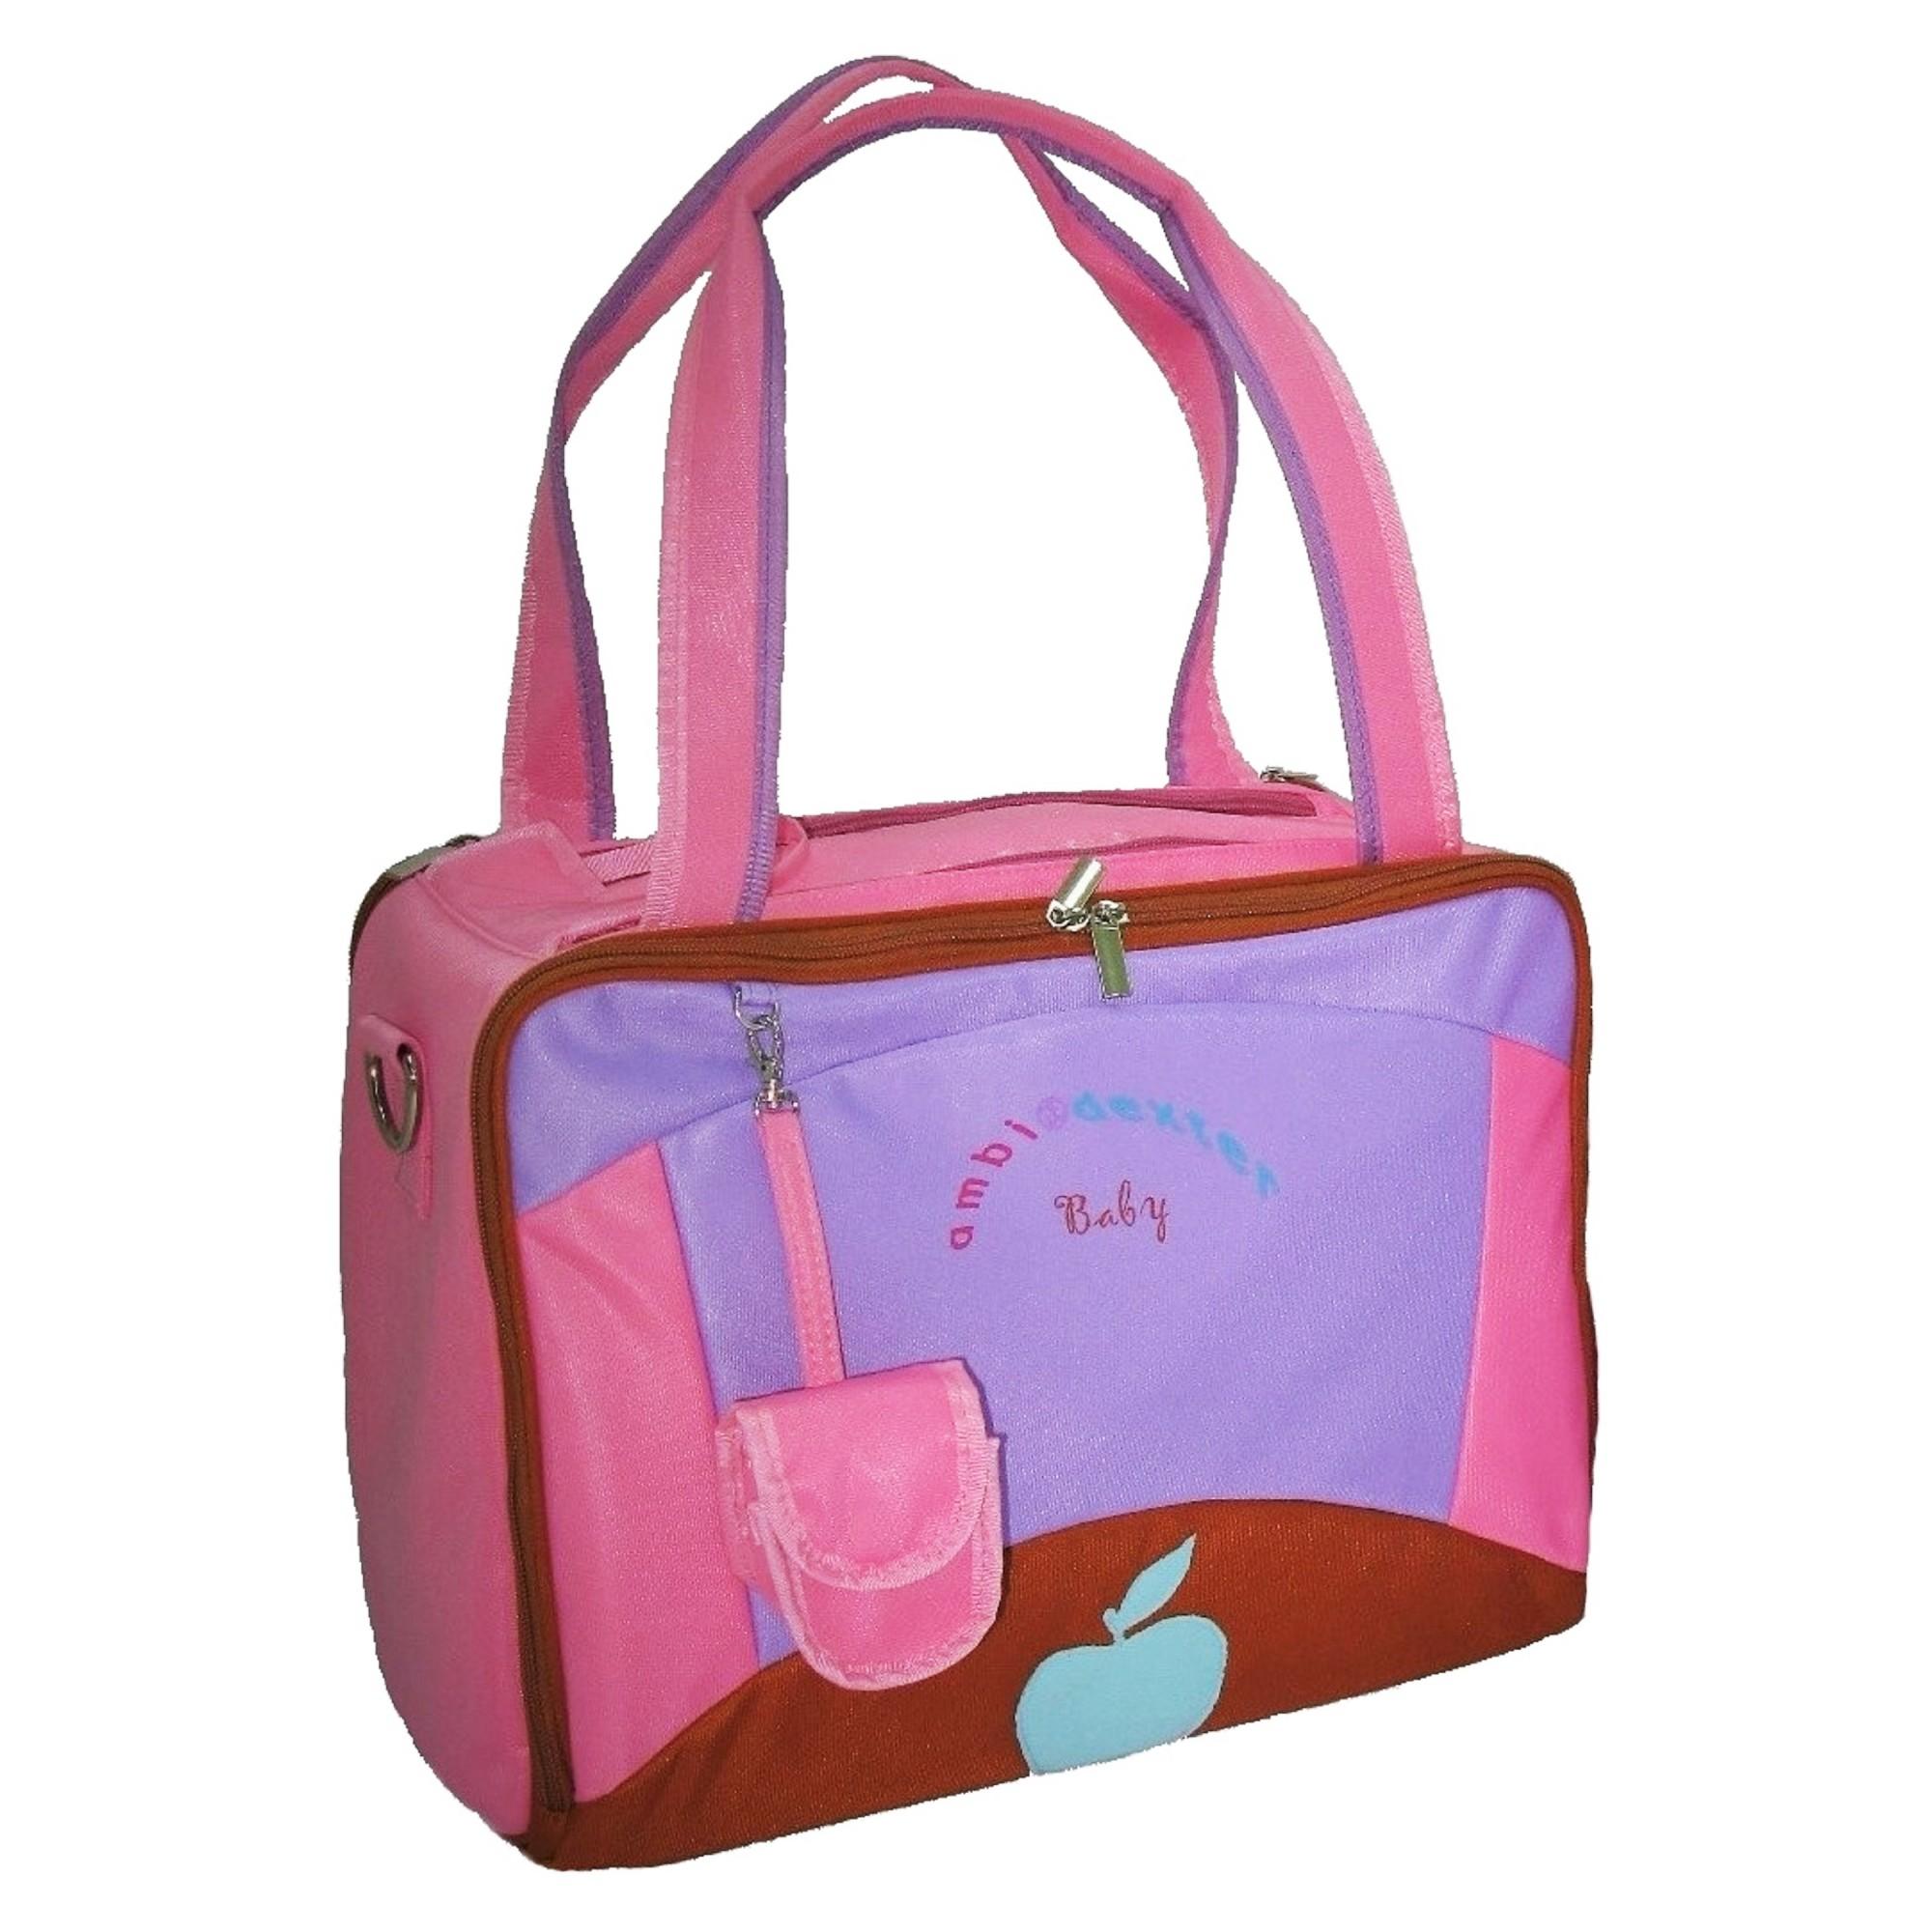 100% machine washable nursery bag - MB31